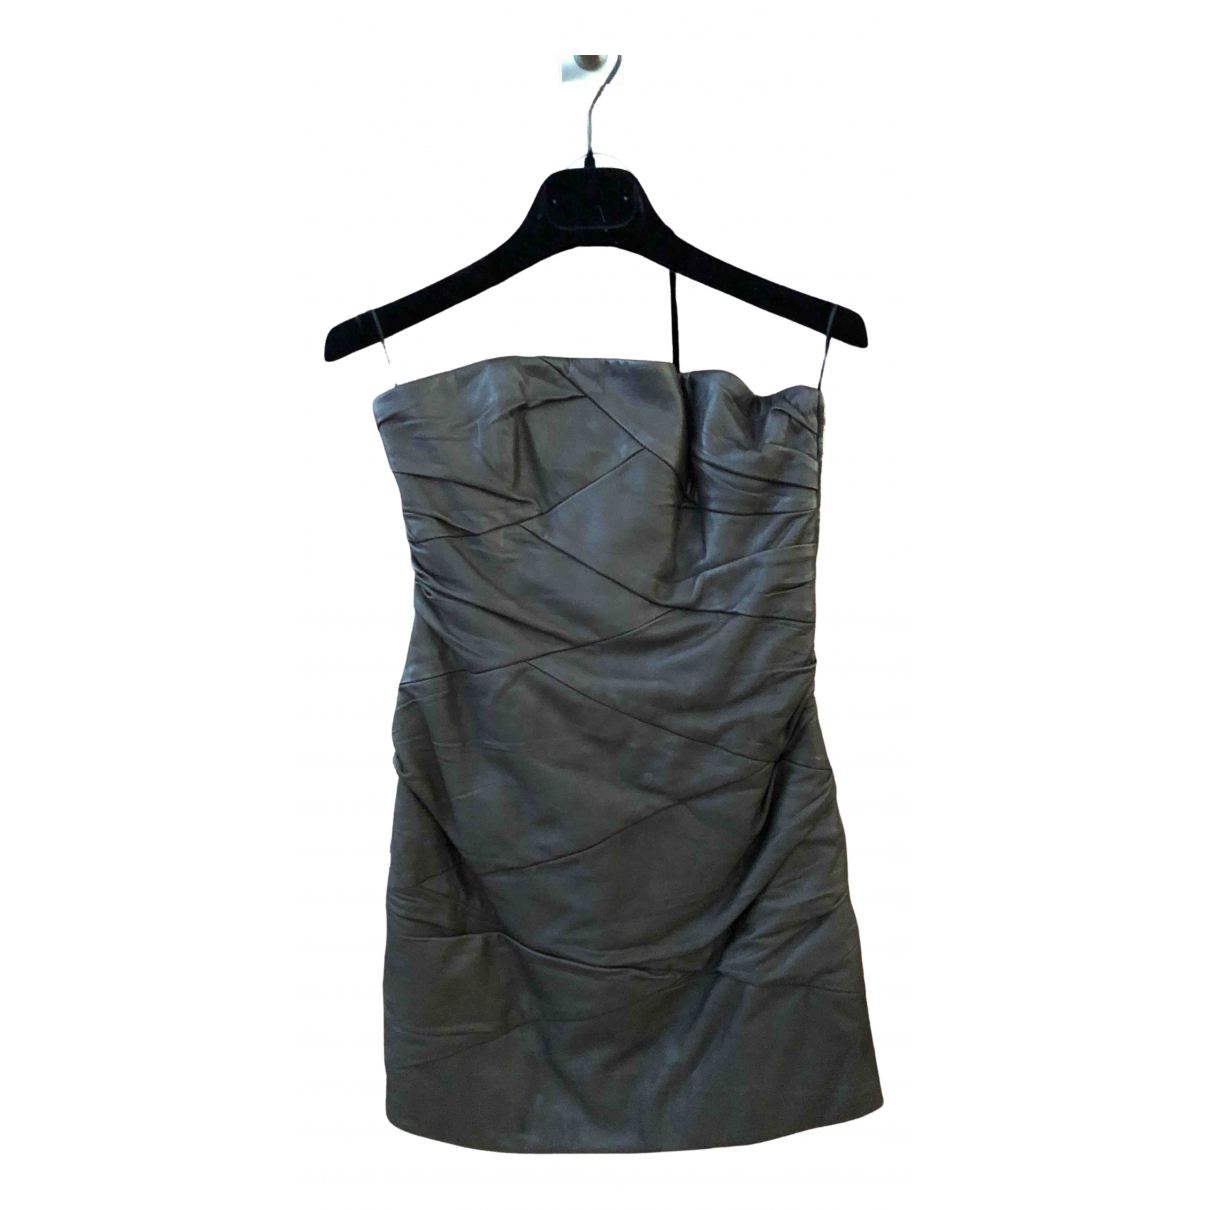 Jay Ahr - Robe   pour femme en cuir - marron